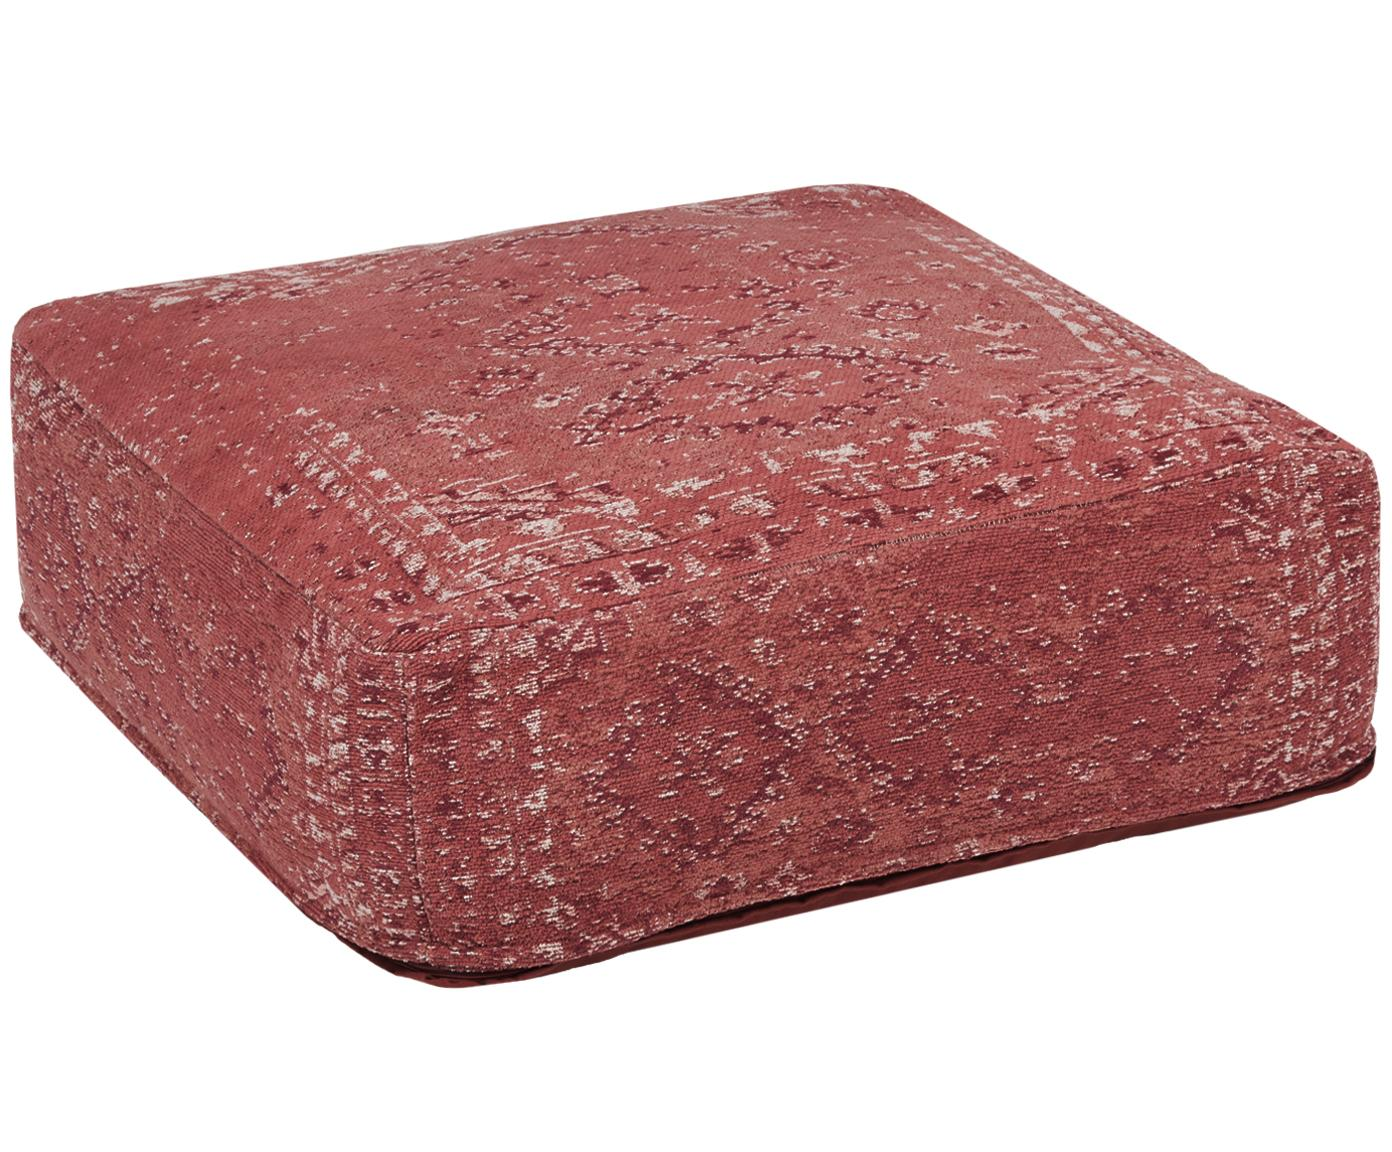 Cuscino da pavimento vintage Rebel, Rivestimento: 95% cotone, 5% poliestere, Rosso ruggine, crema, rosso, Larg. 70 x Alt. 20 cm